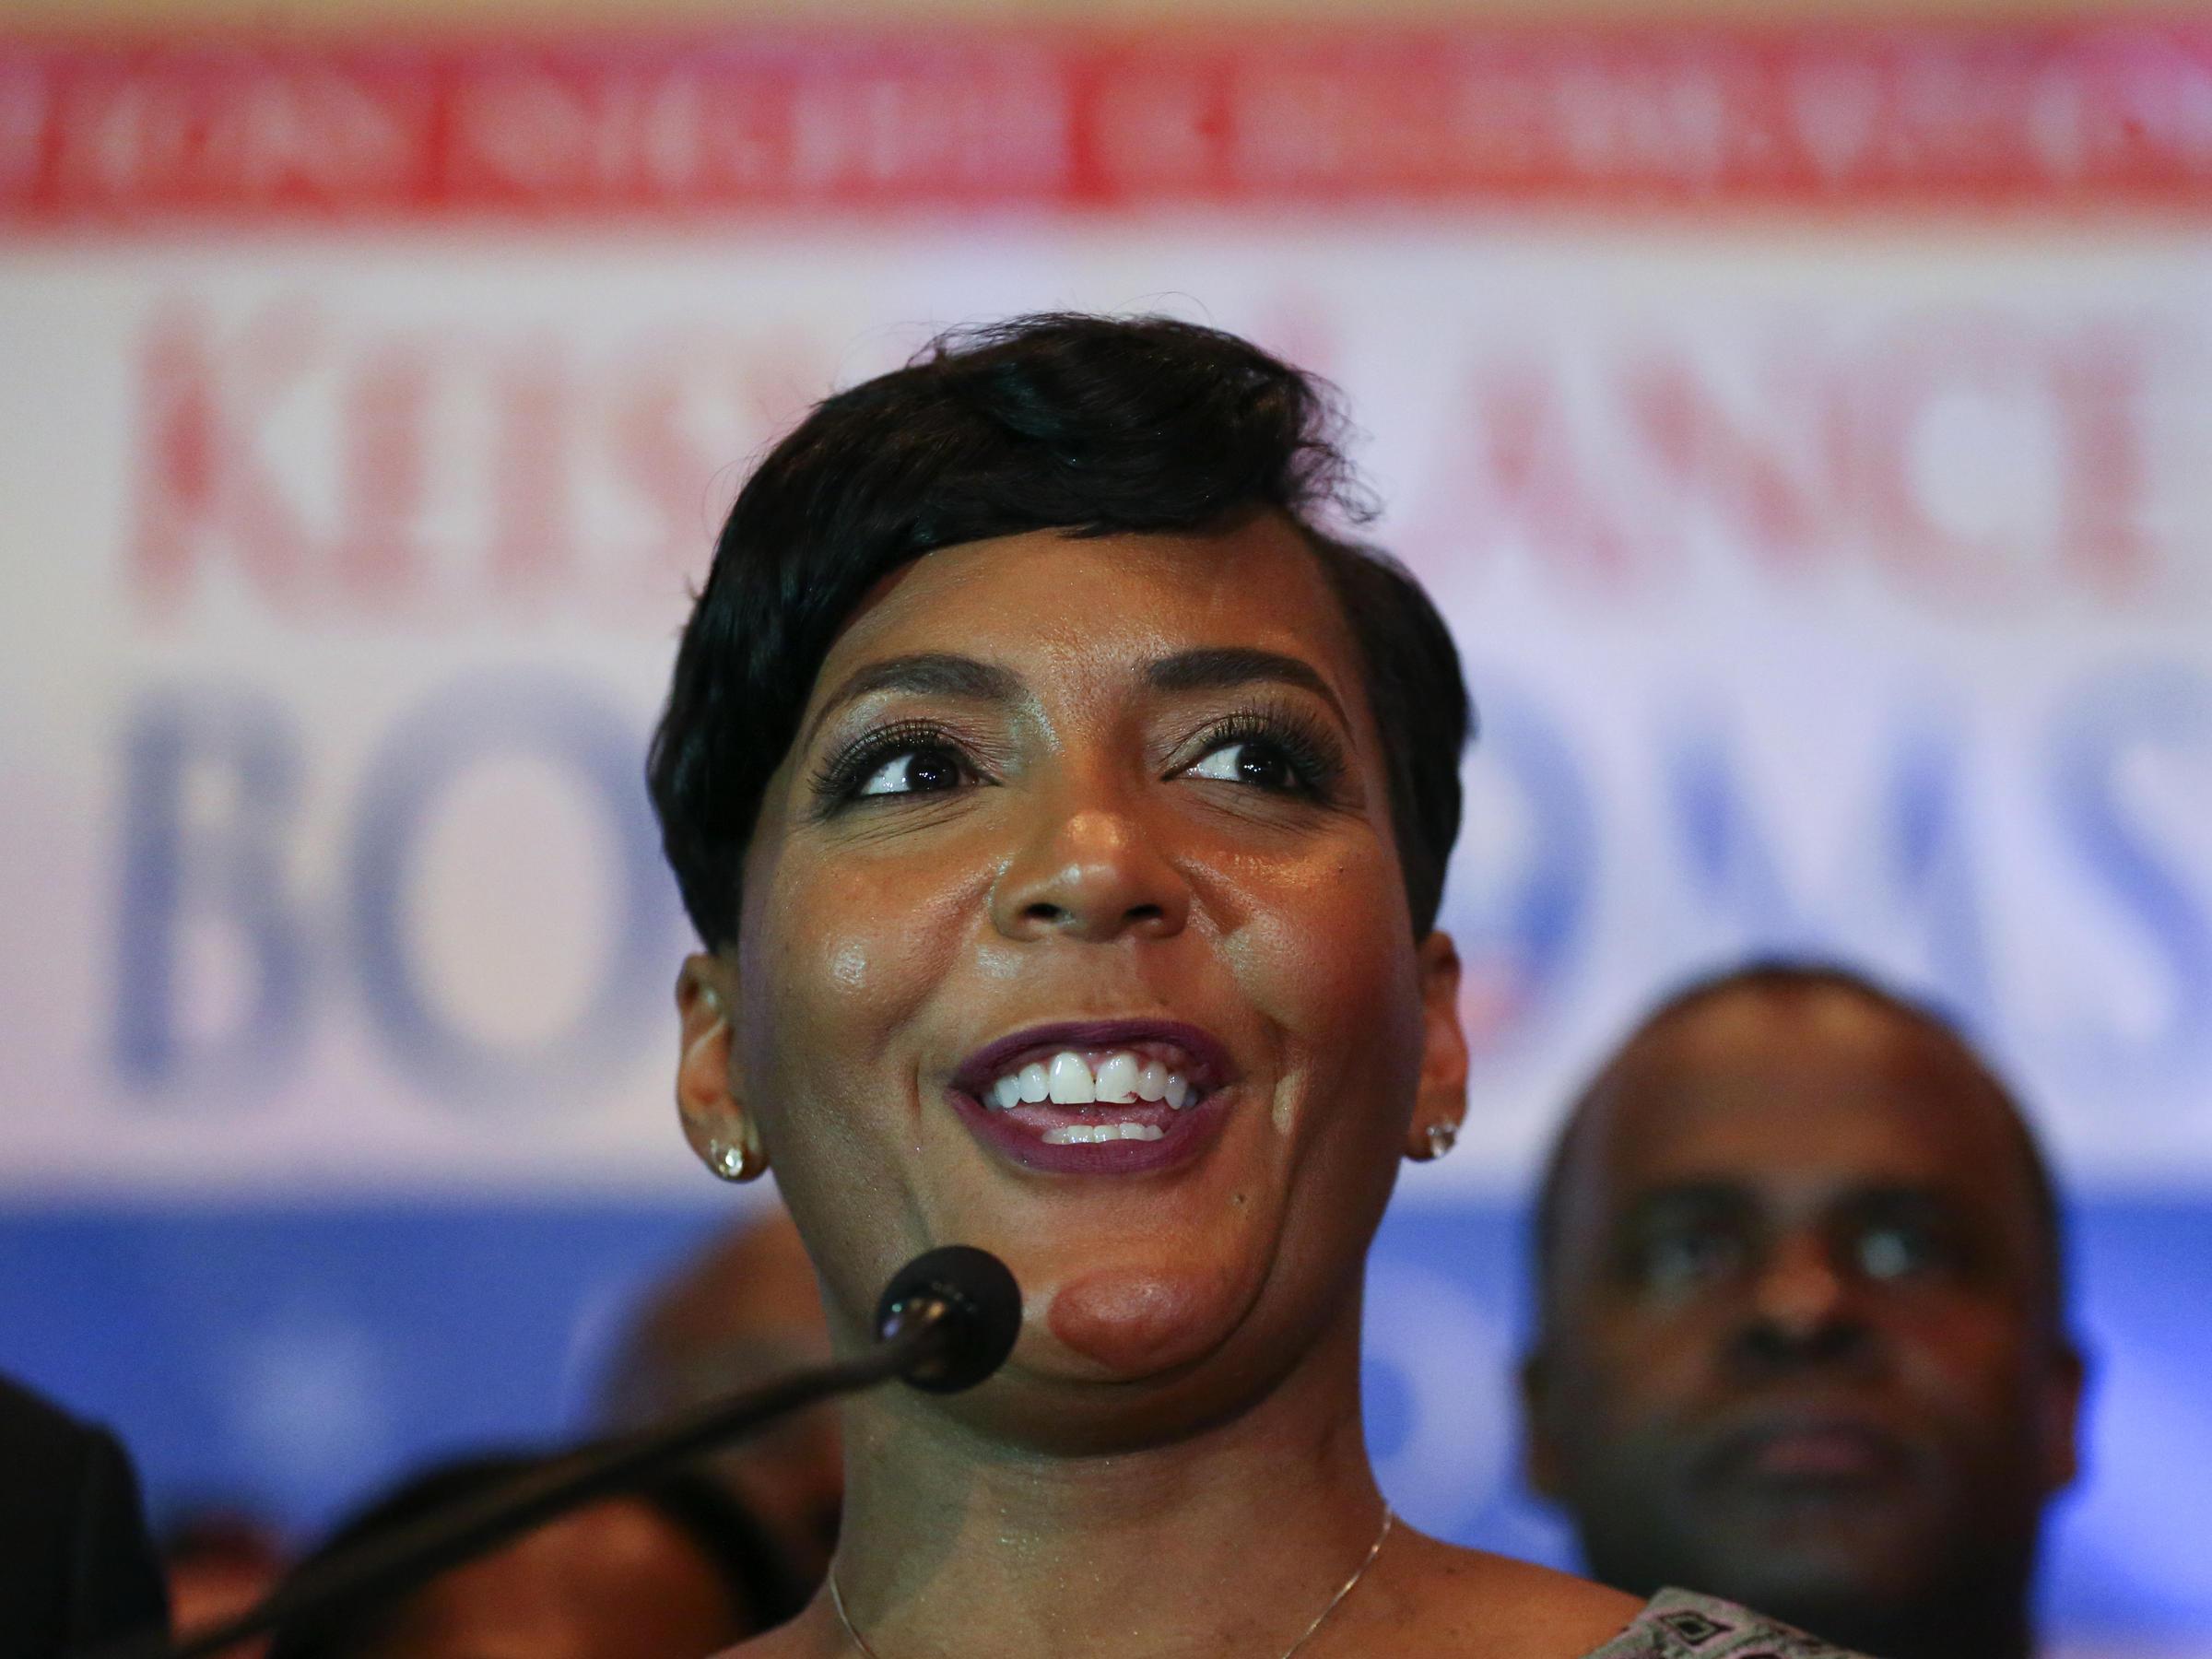 Polls close in Atlanta's mayoral runoff